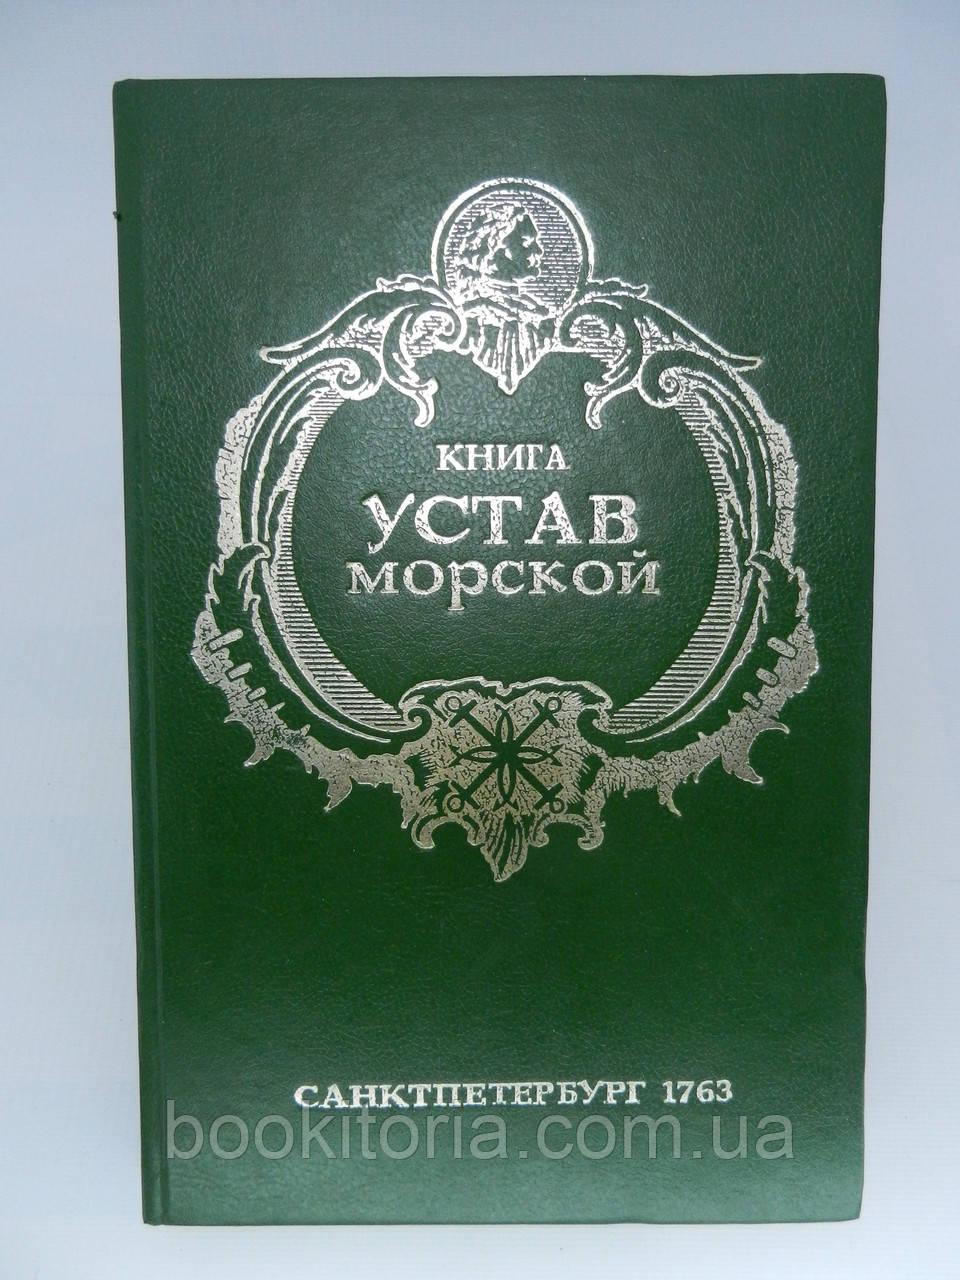 Книга: Морской устав (б/у).